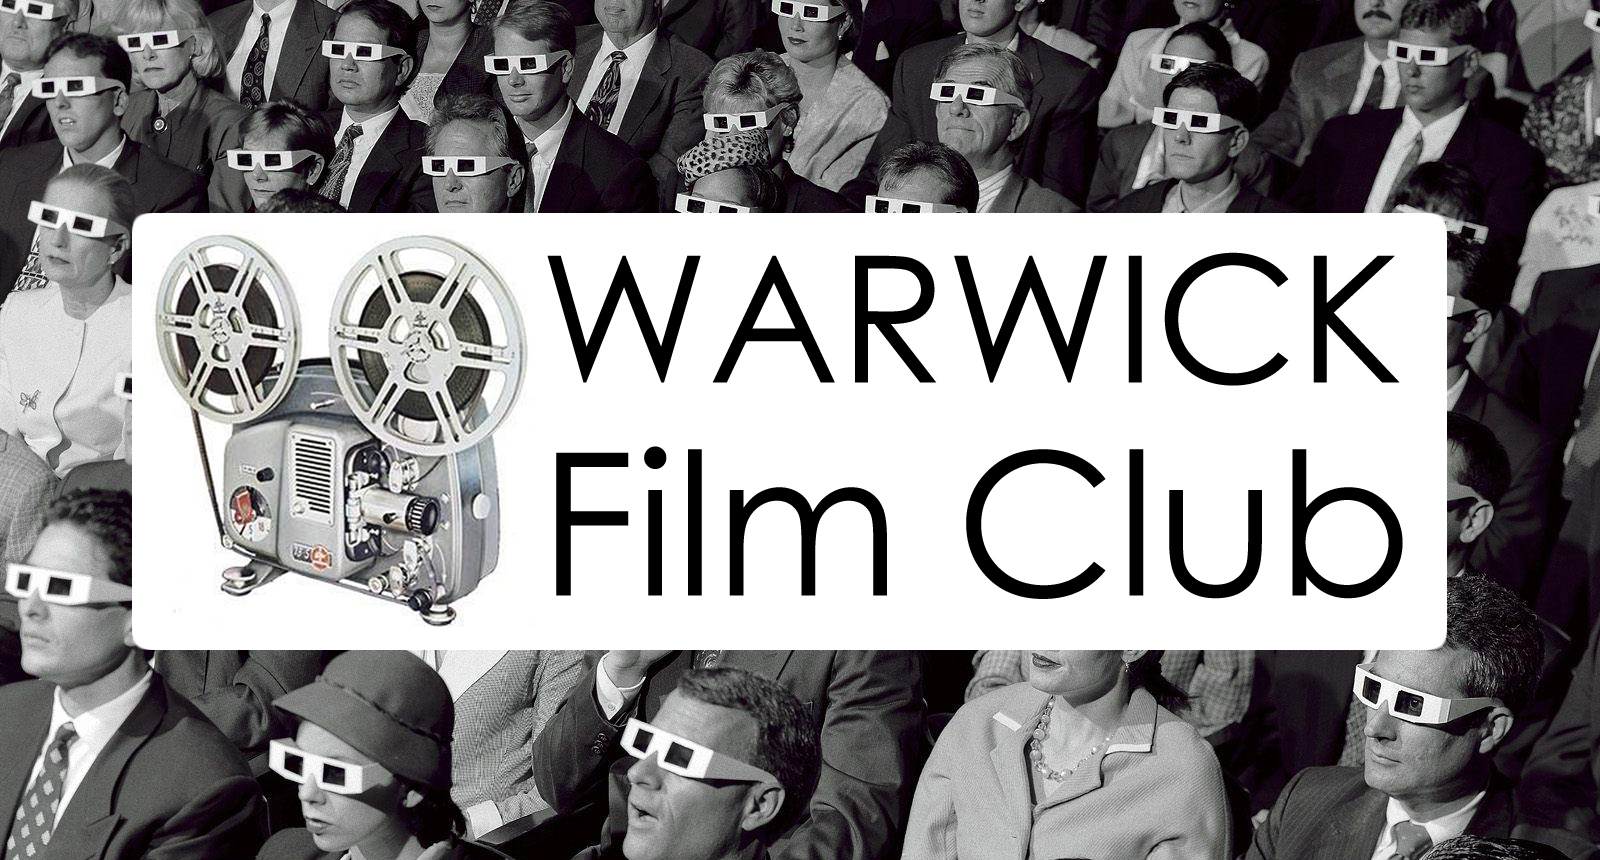 warwick film club logo